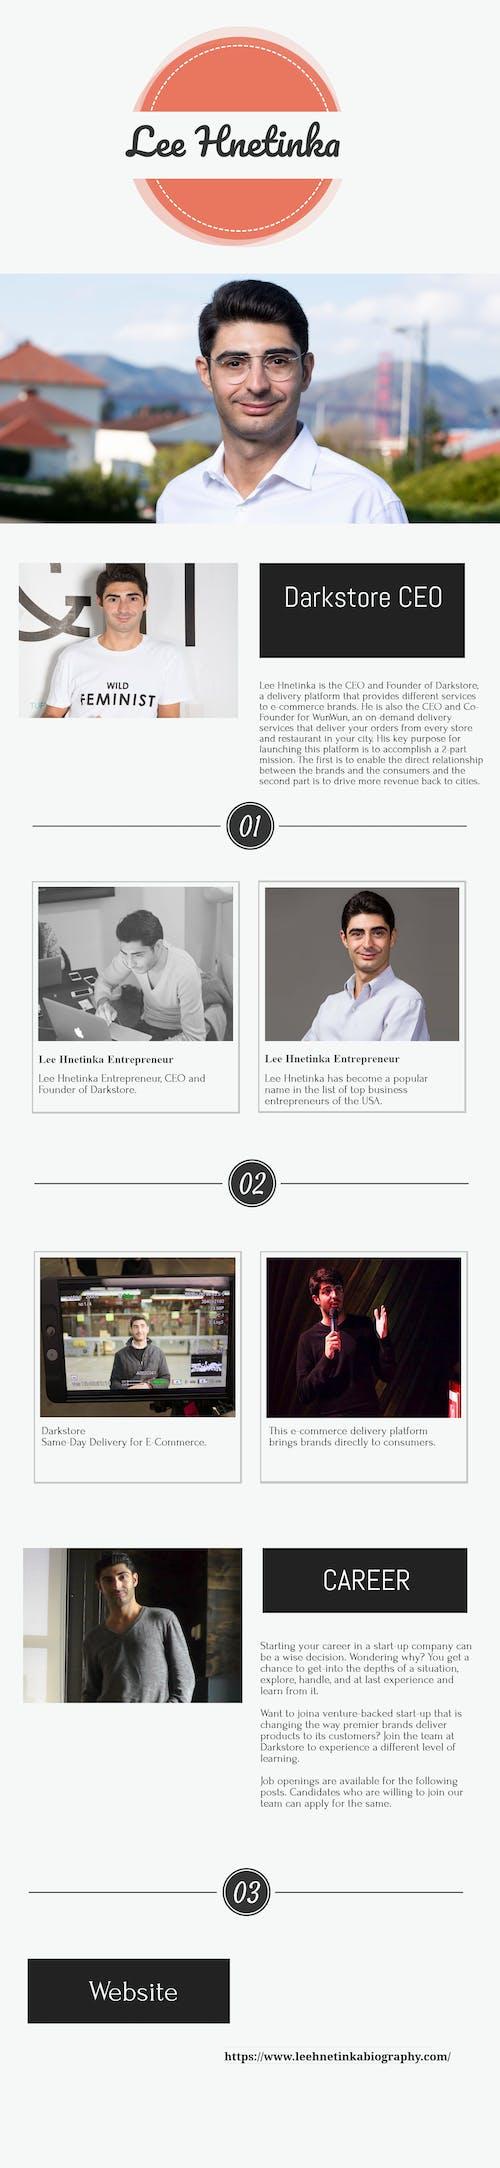 Free stock photo of entrepreneur, Lee Hnetinka